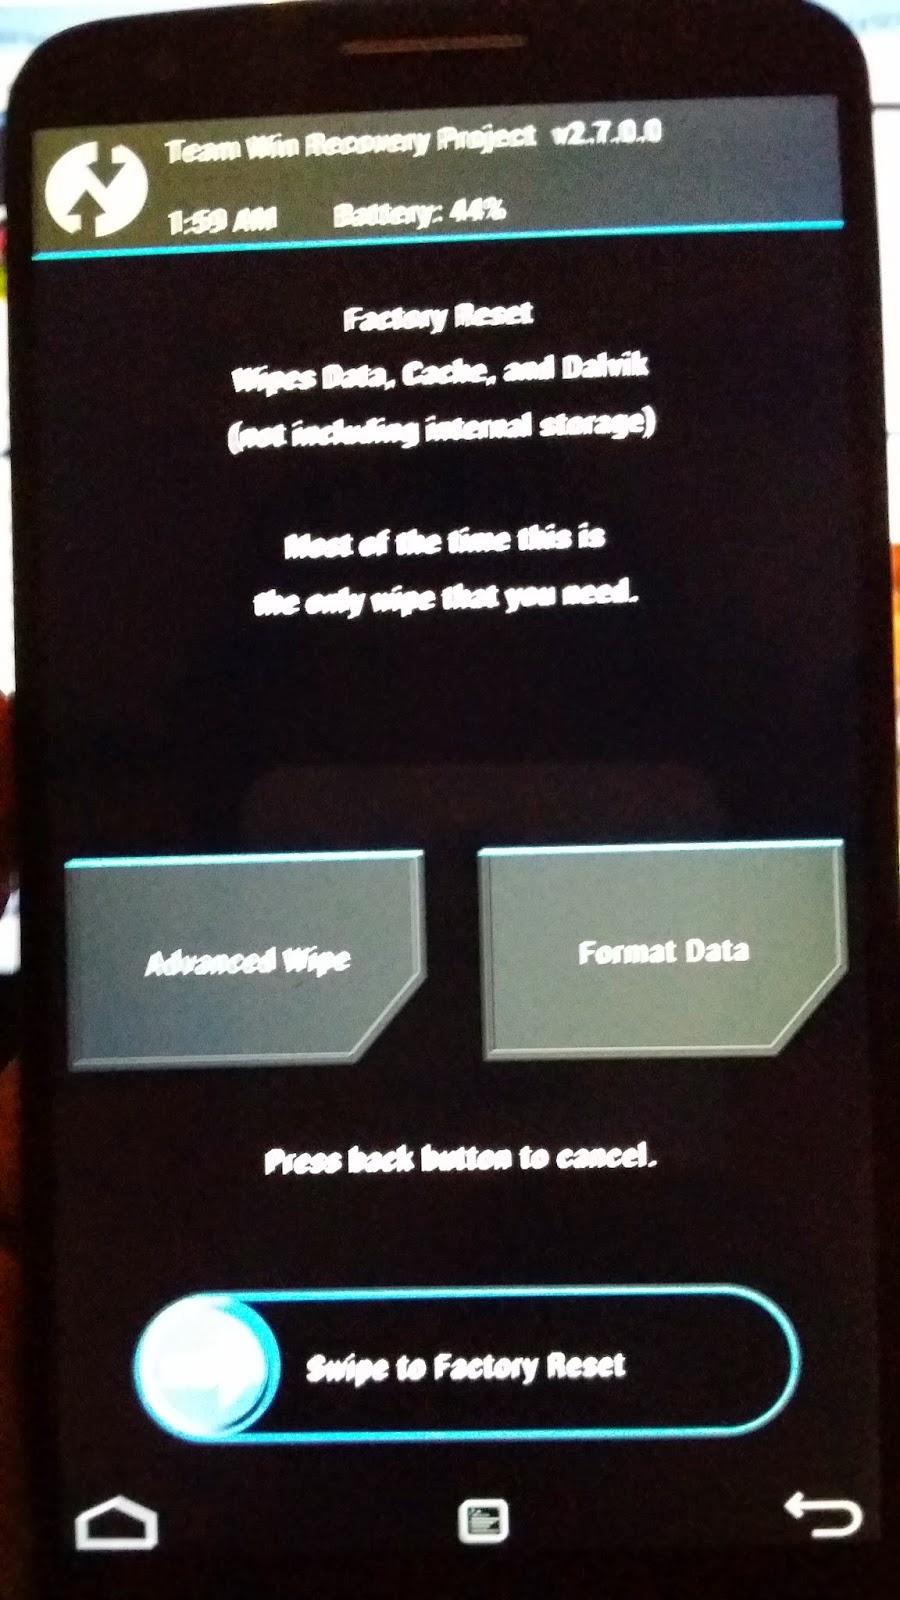 شرح تثبيت روم AICP ROM لجهاز LG G2 | بحرية درويد